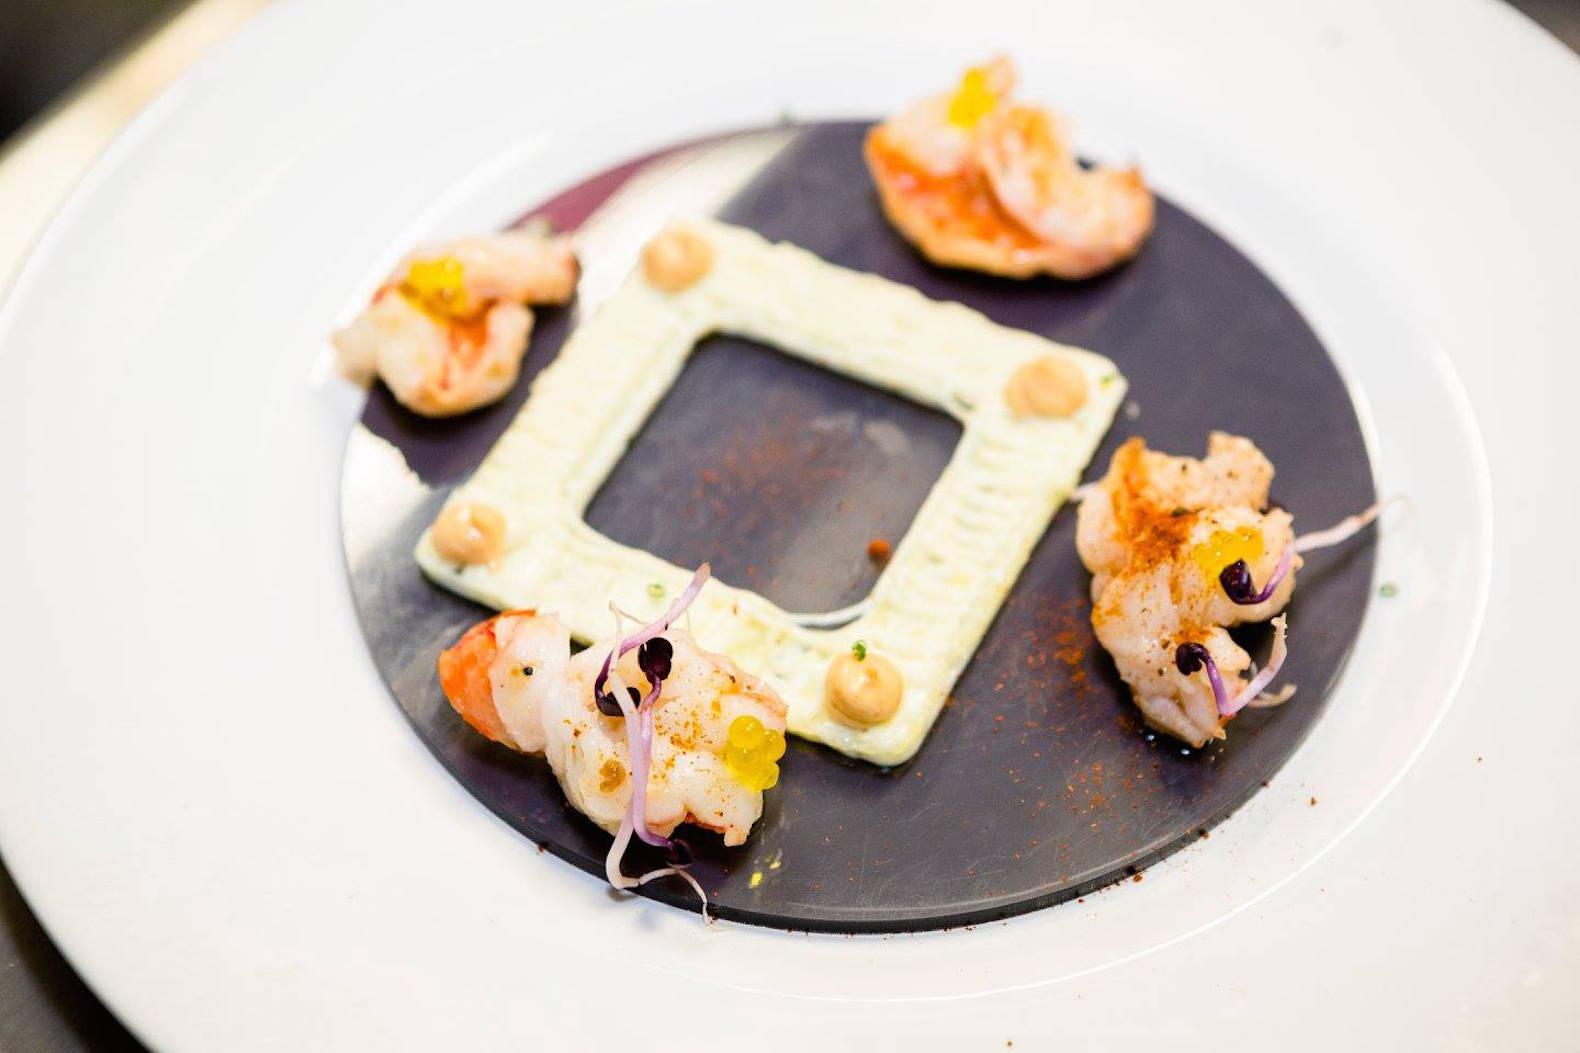 London Pop-Up Restaurant Serves 3D Printed Food